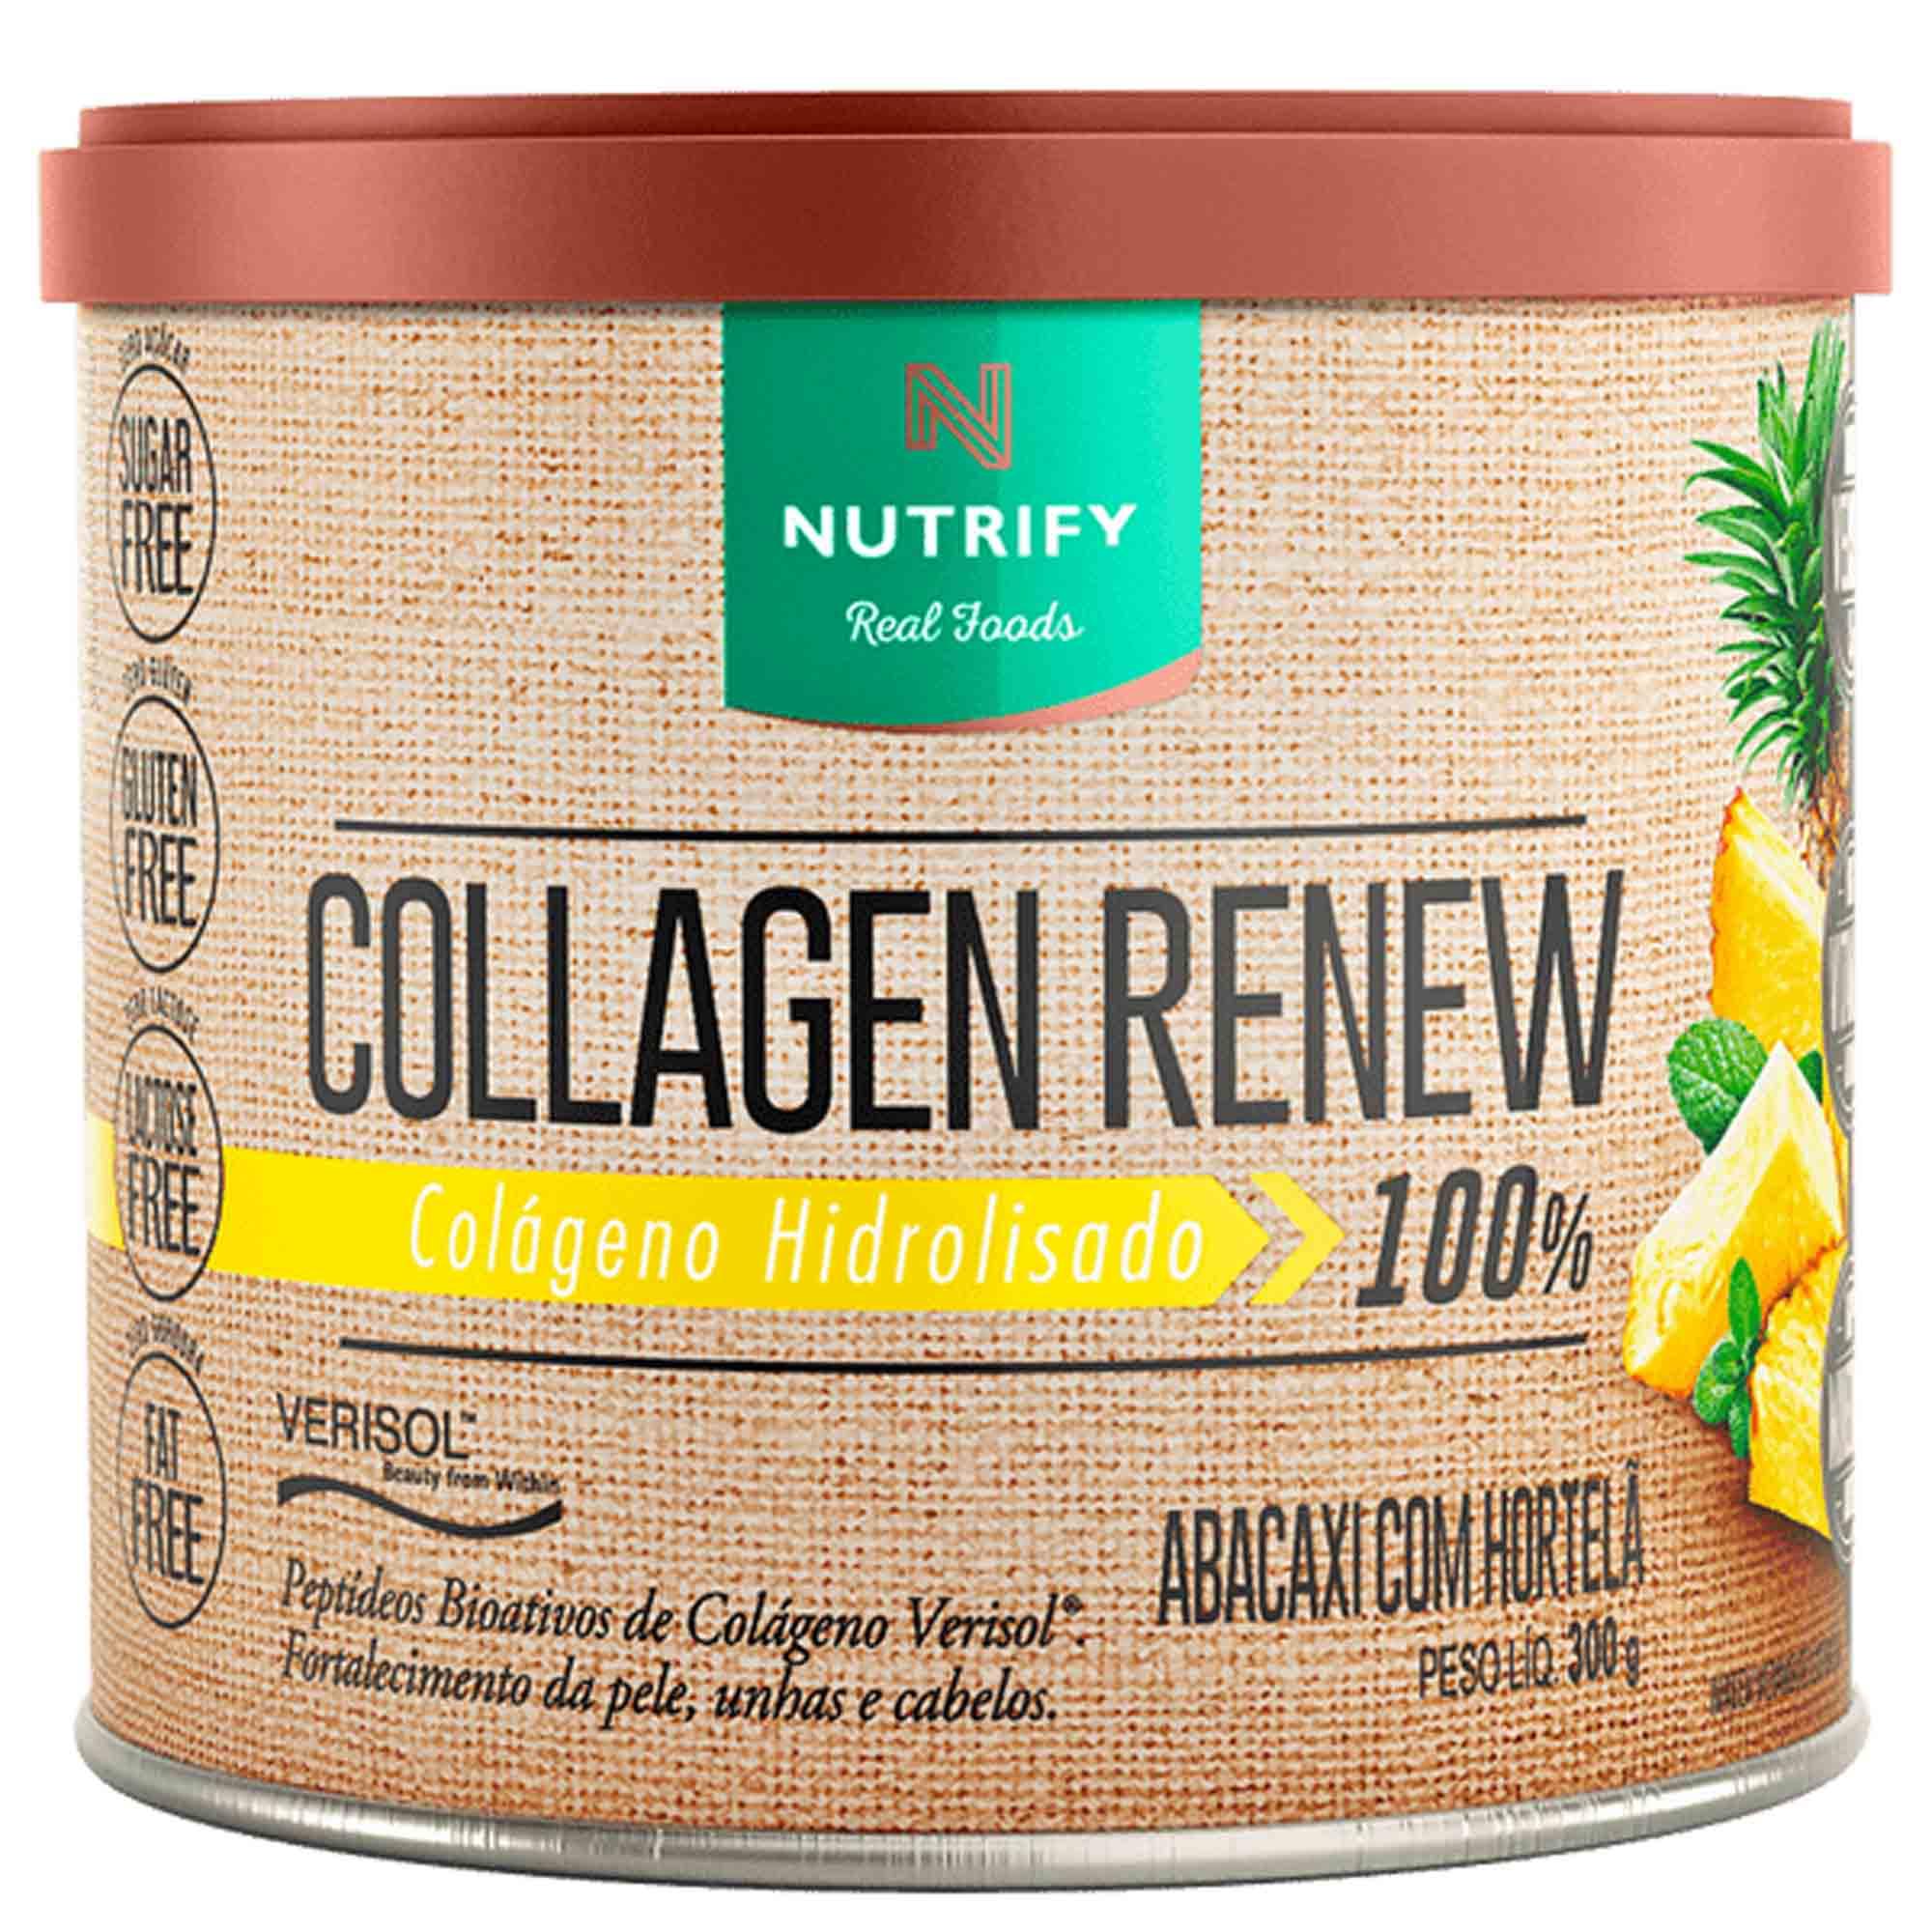 Collagen Renew sabor Abacaxi C/ Hortelã 300g Nutrify